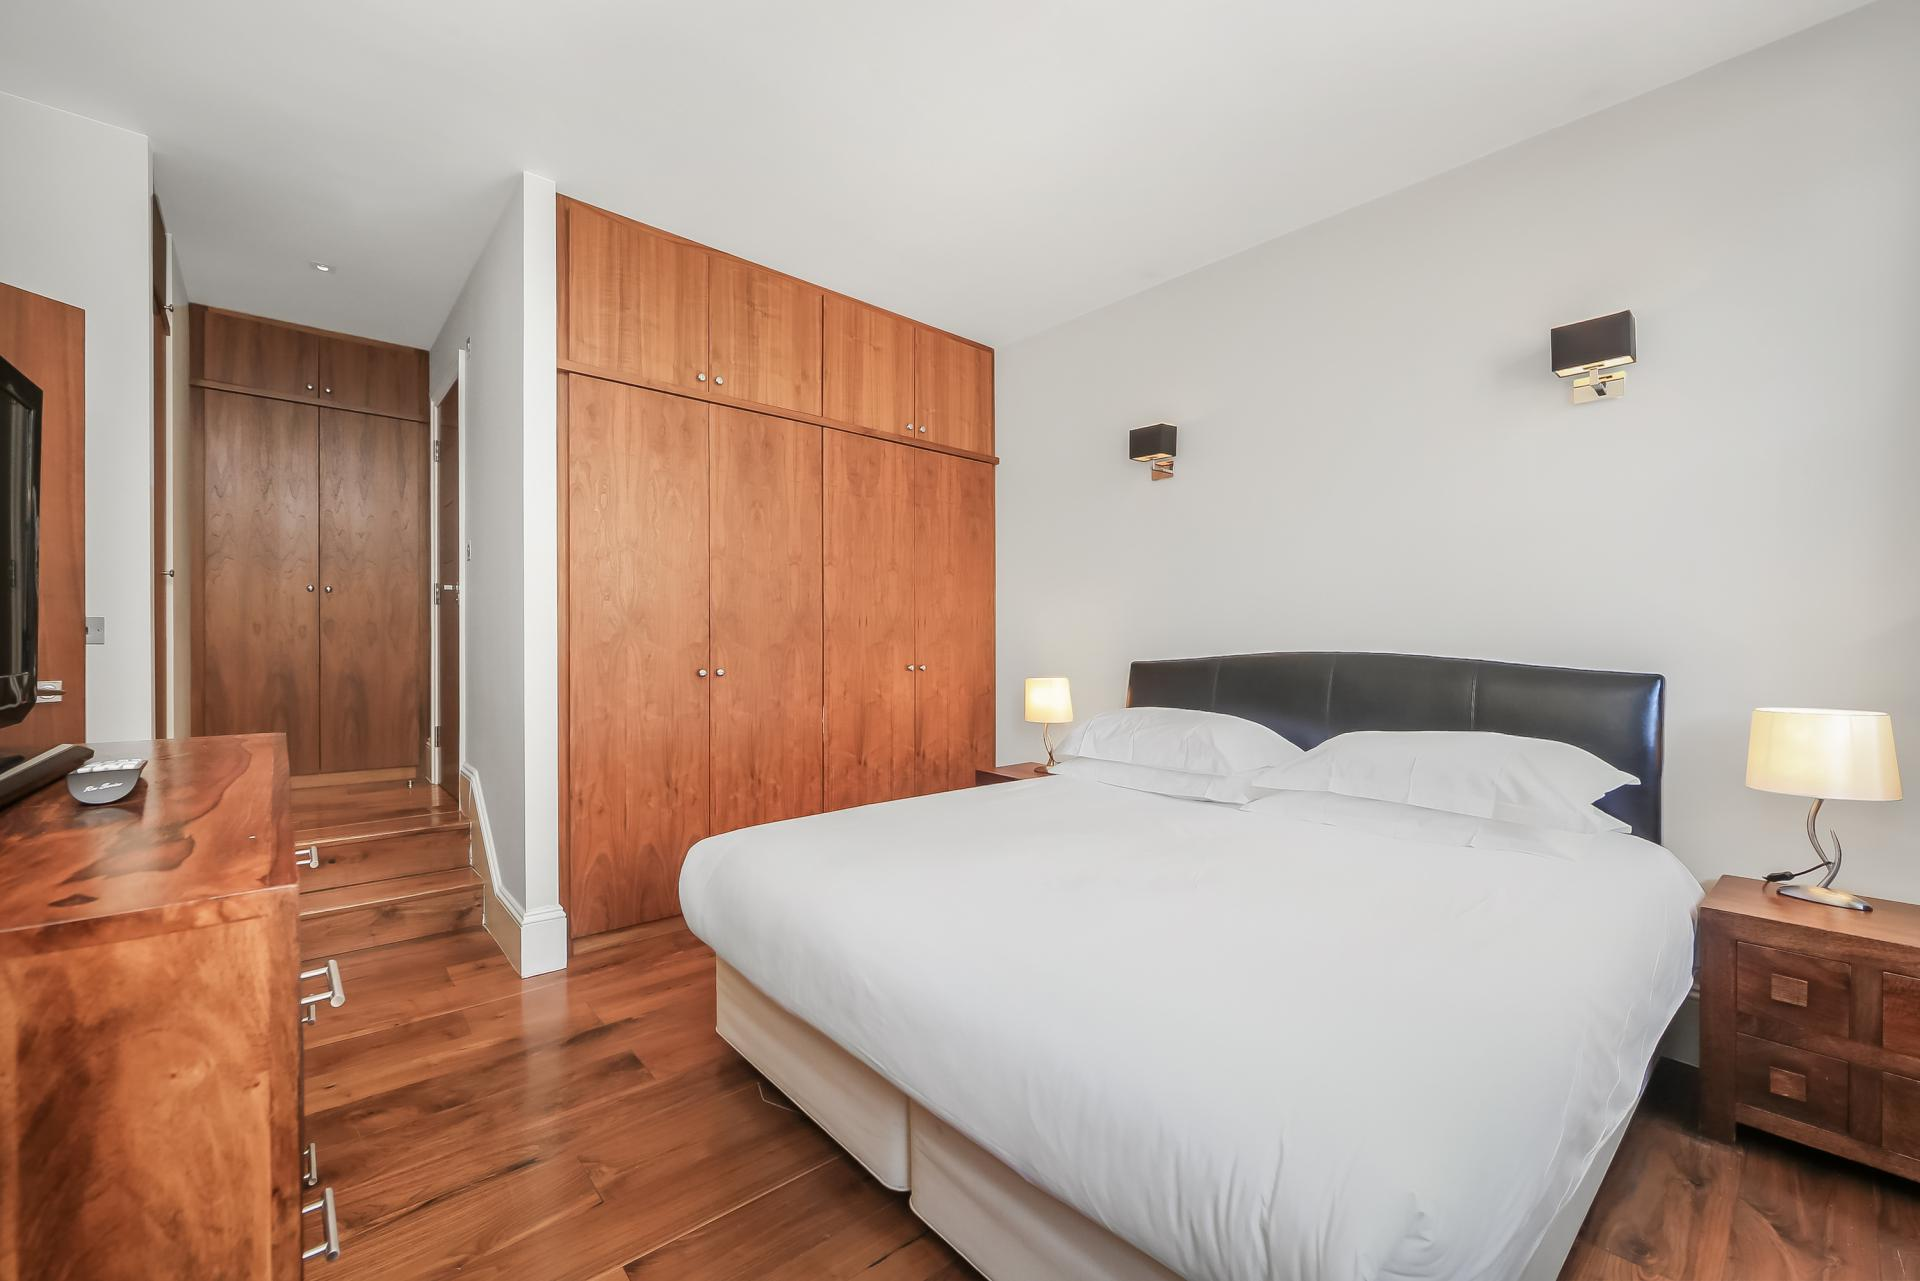 Double bed at Tavistock Place Apartments, Fitzrovia, London - Citybase Apartments